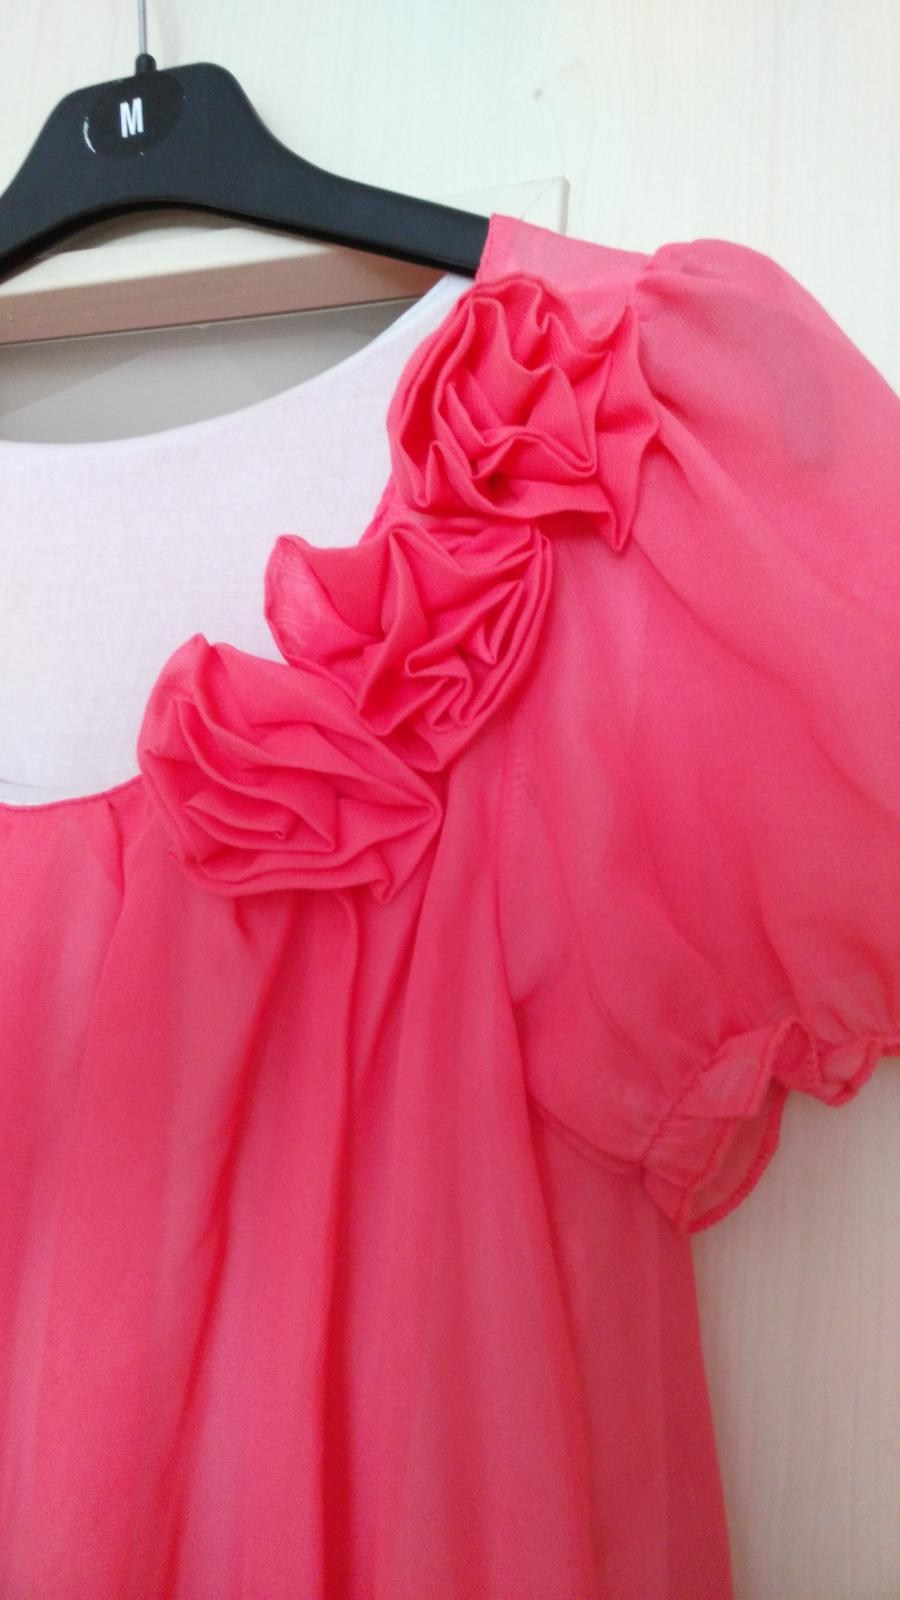 Lososové šifónové šaty 36-38 (S-M) - Obrázok č. 2